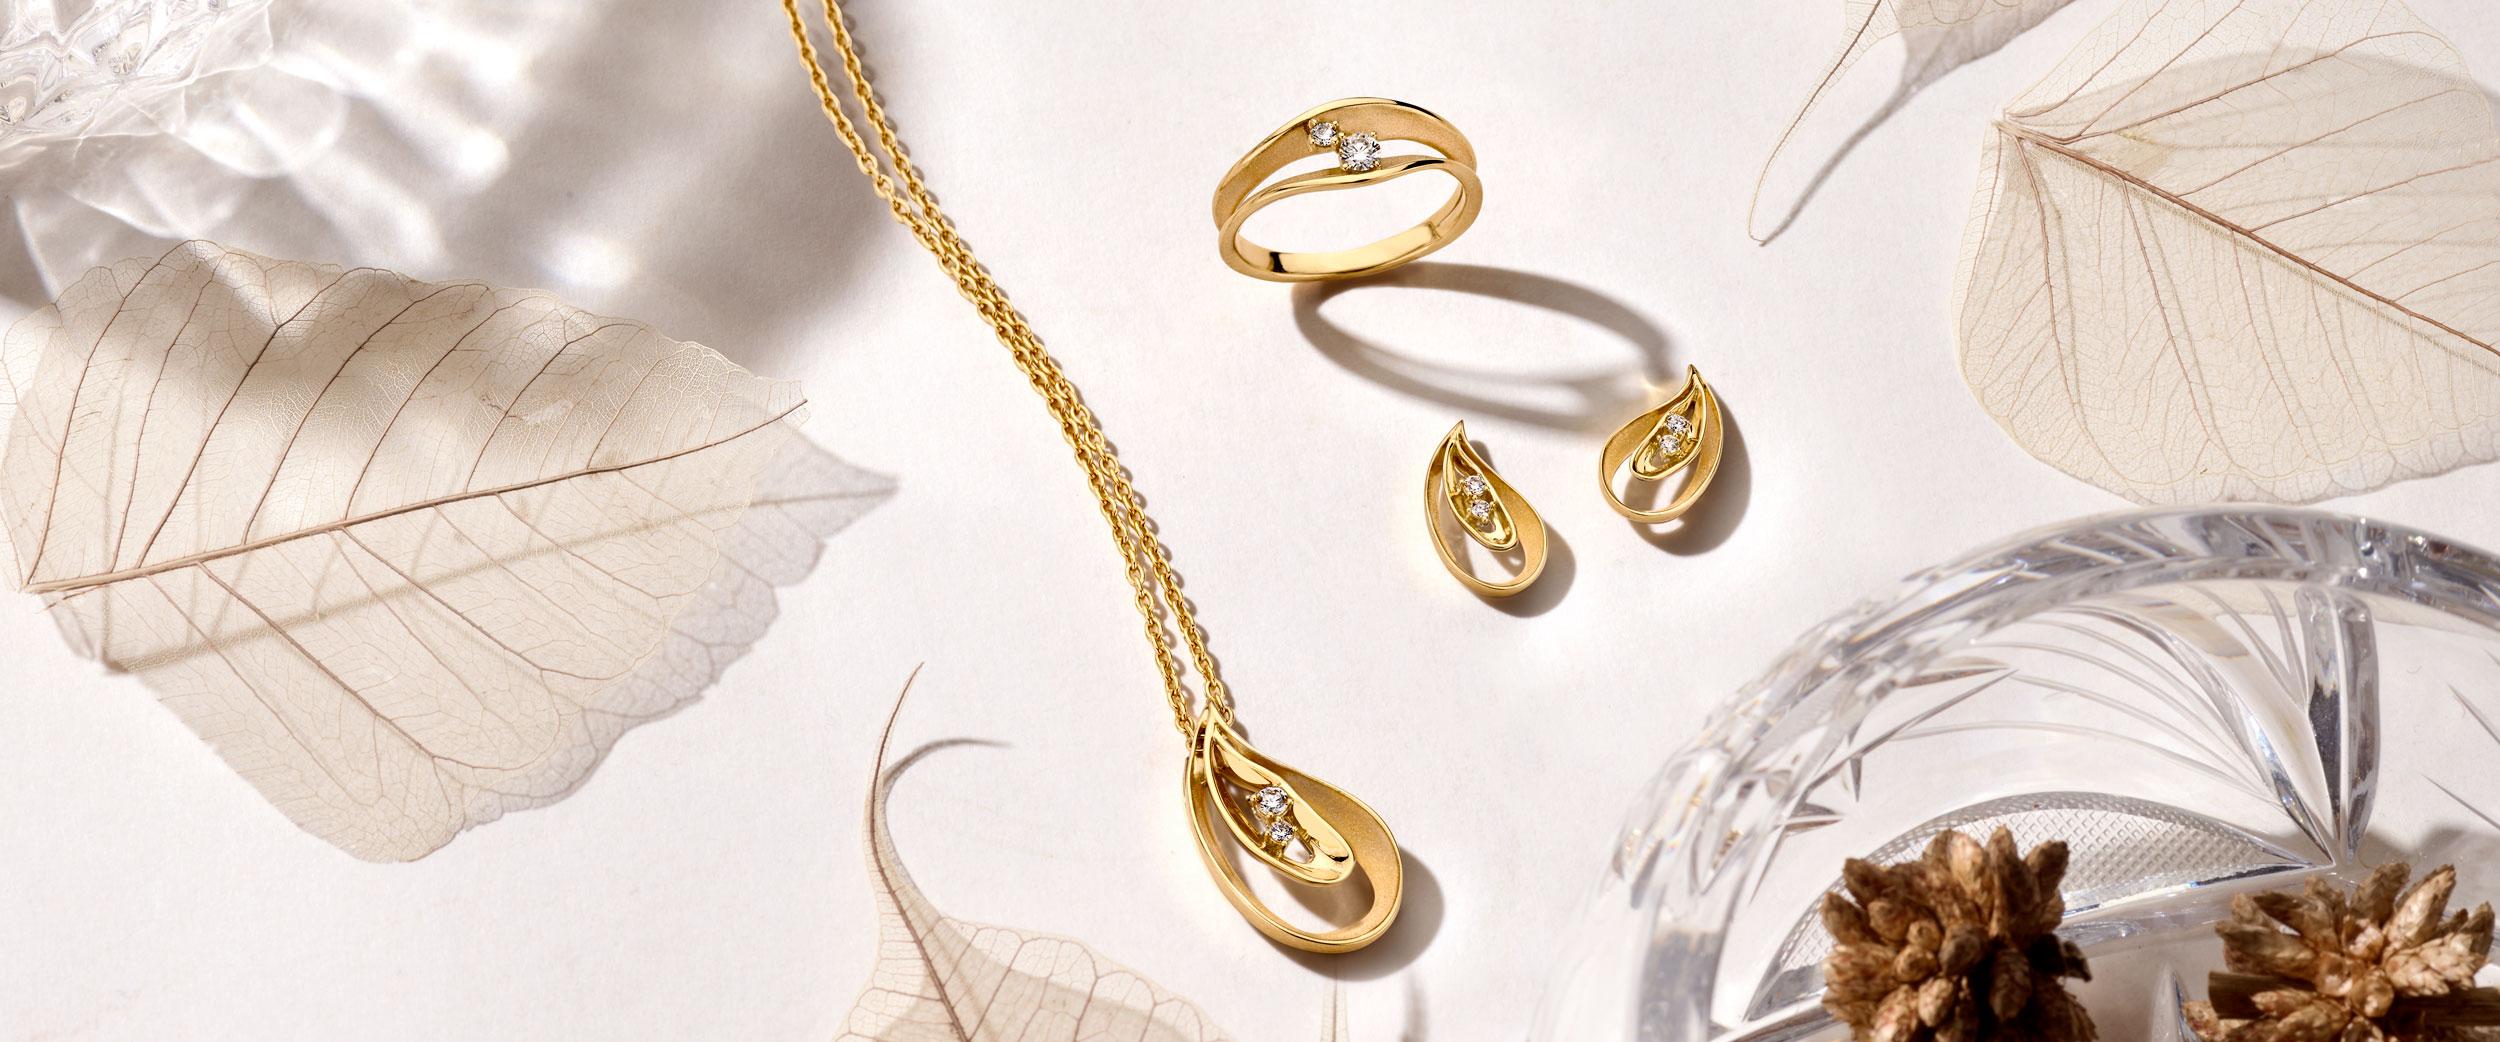 valcke, diluna, valcke jewelry, juwelier, di luna, juwelen